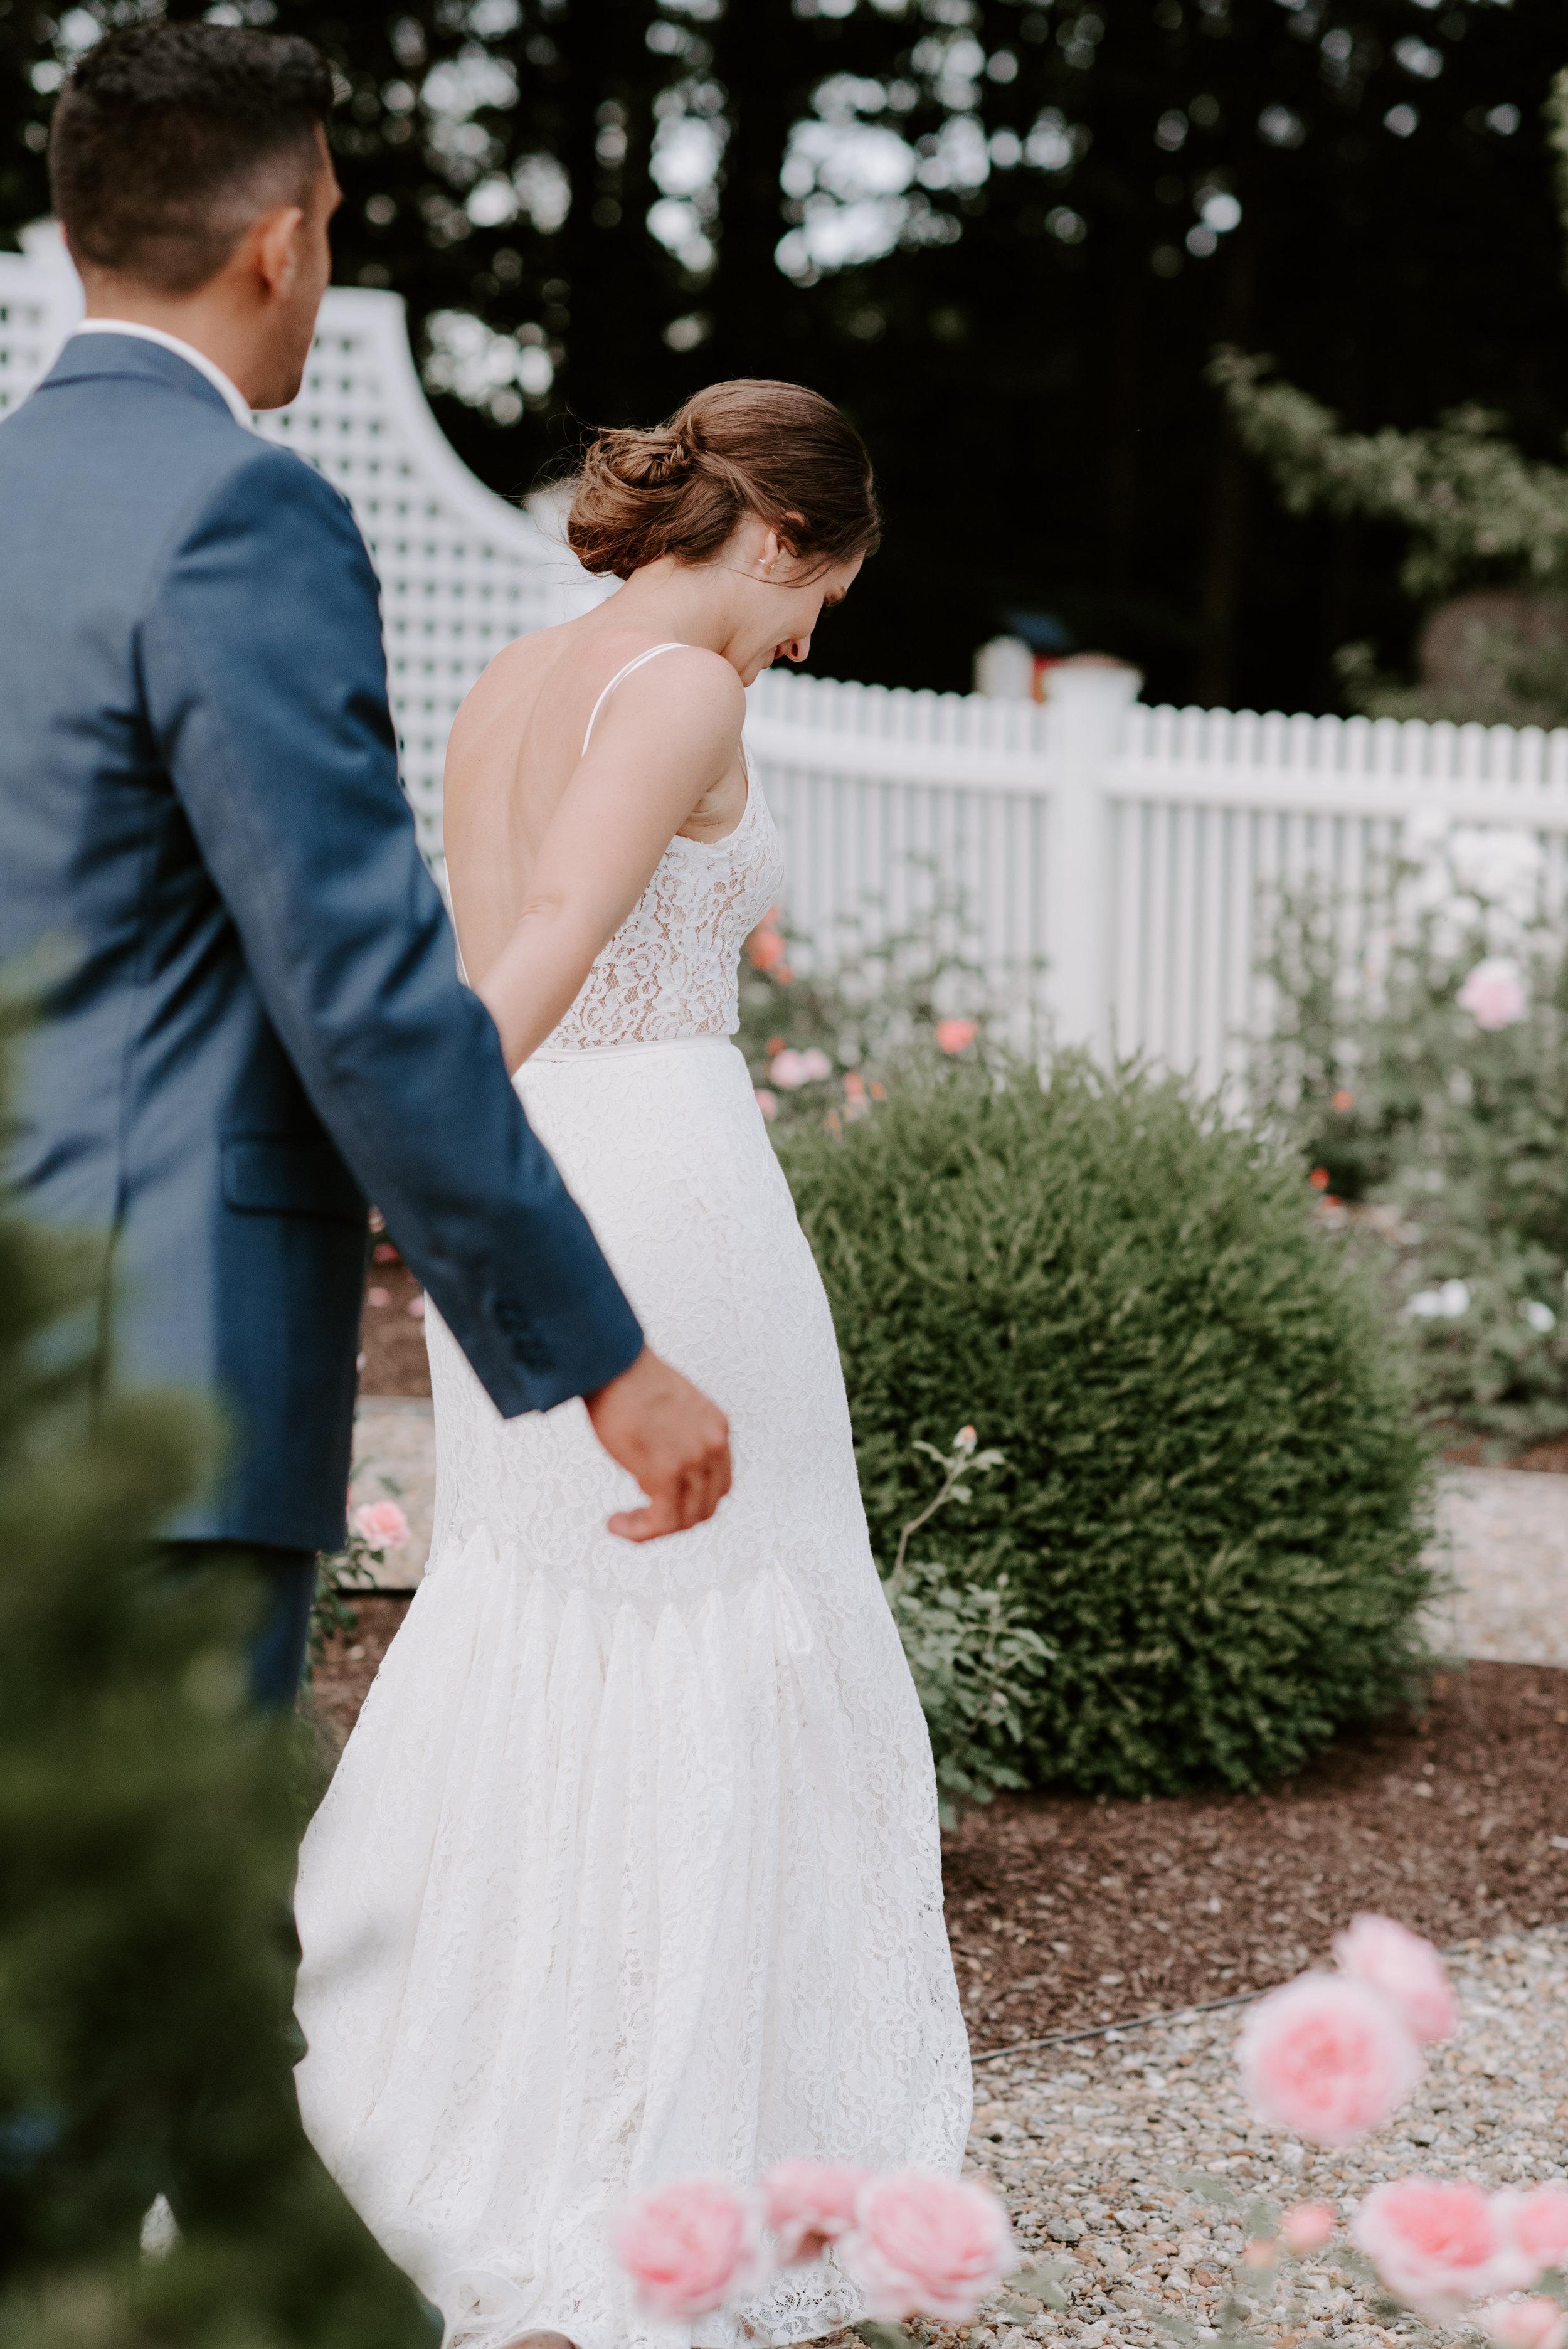 Formal Rose Garden - Beautiful, floral backdrop for outdoor wedding ceremonies.